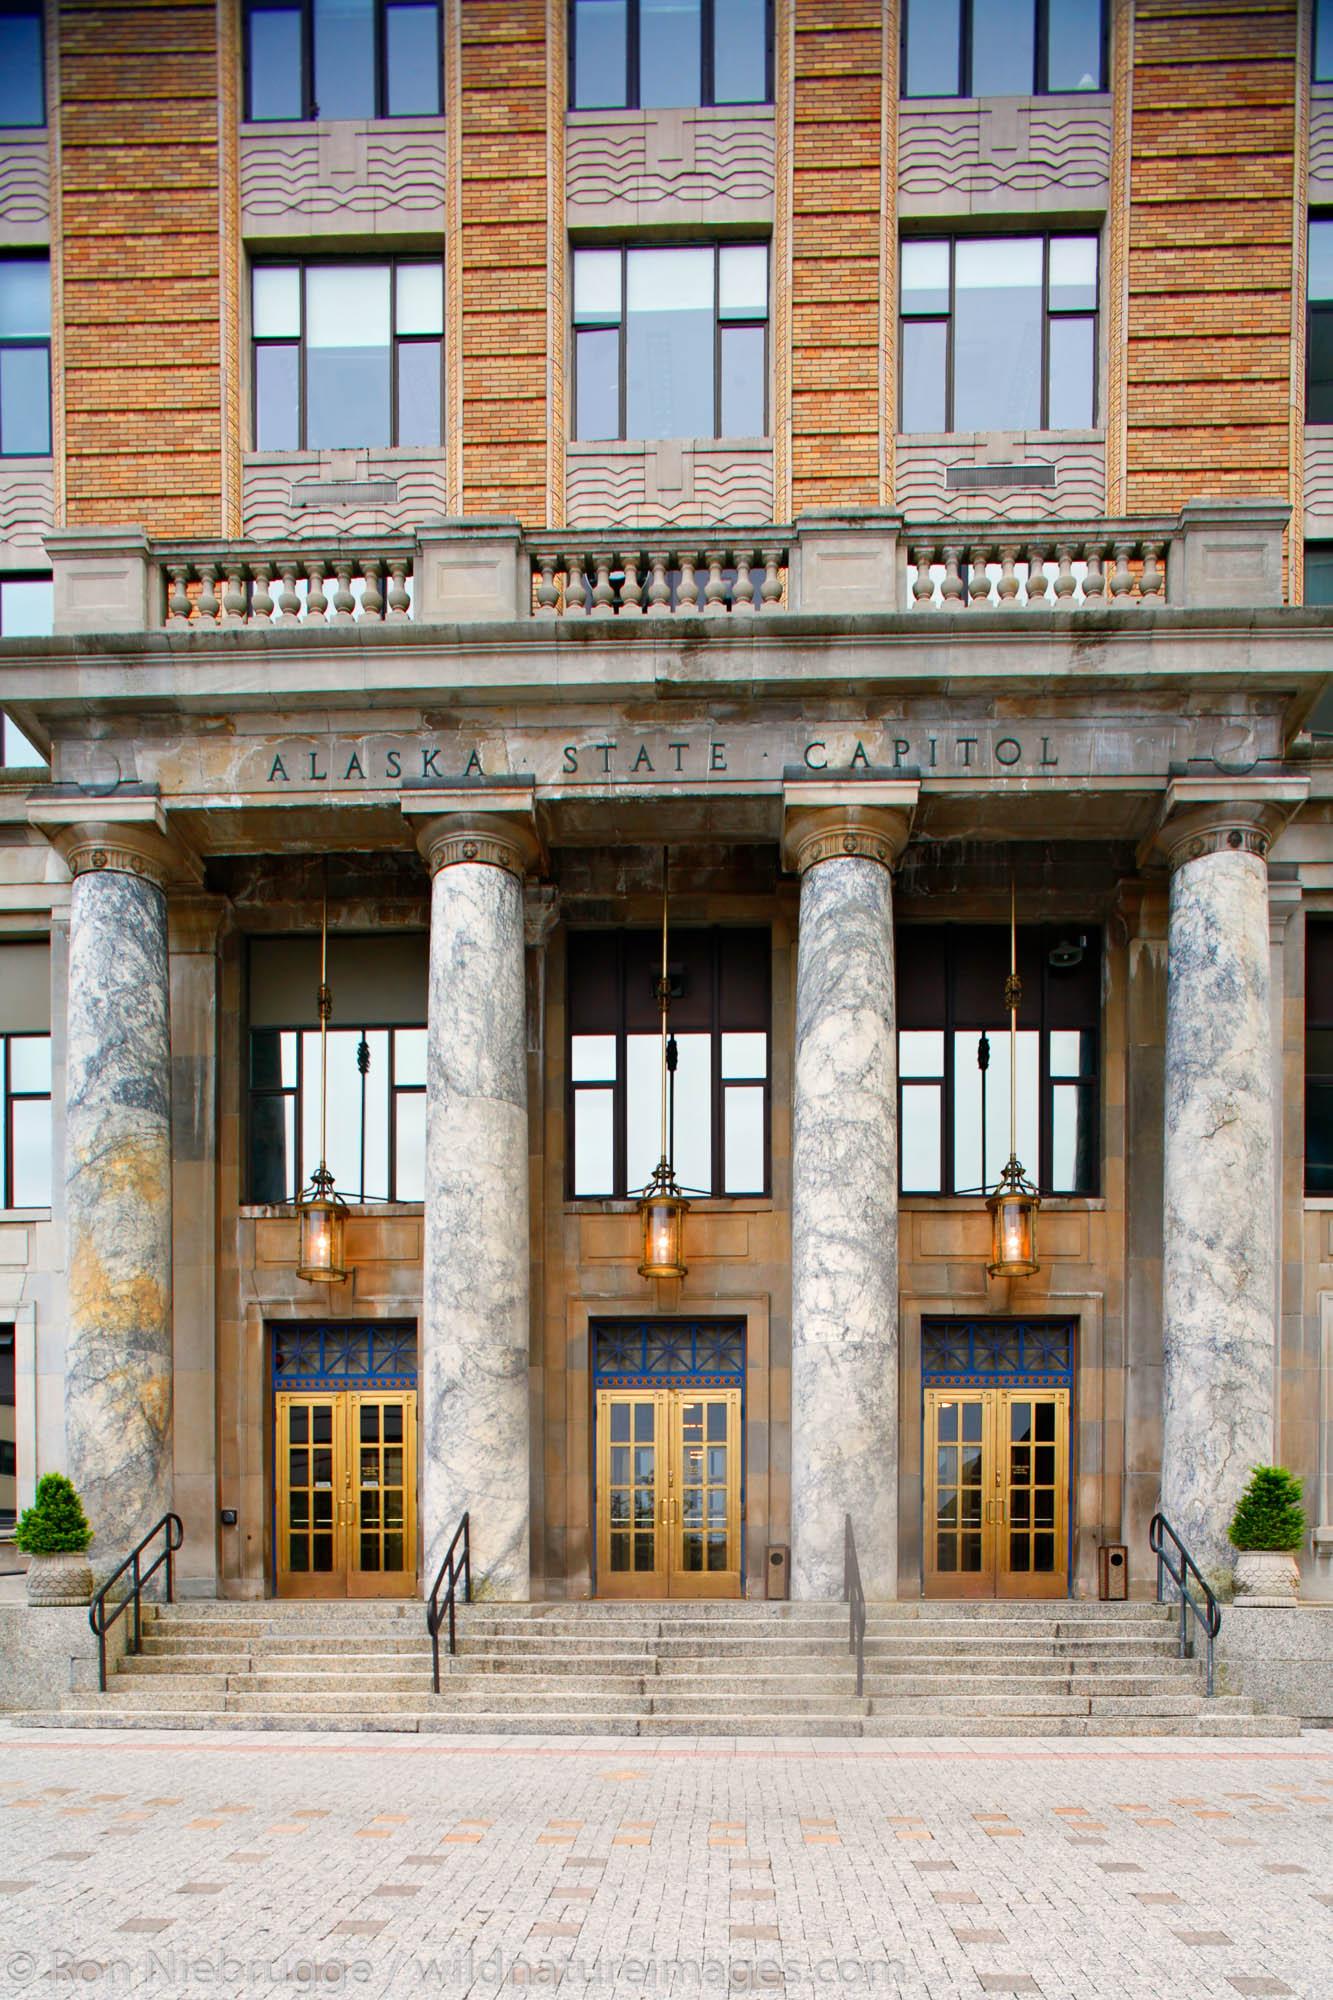 The Alaska State Capitol building, Downtown Juneau, Alaska.